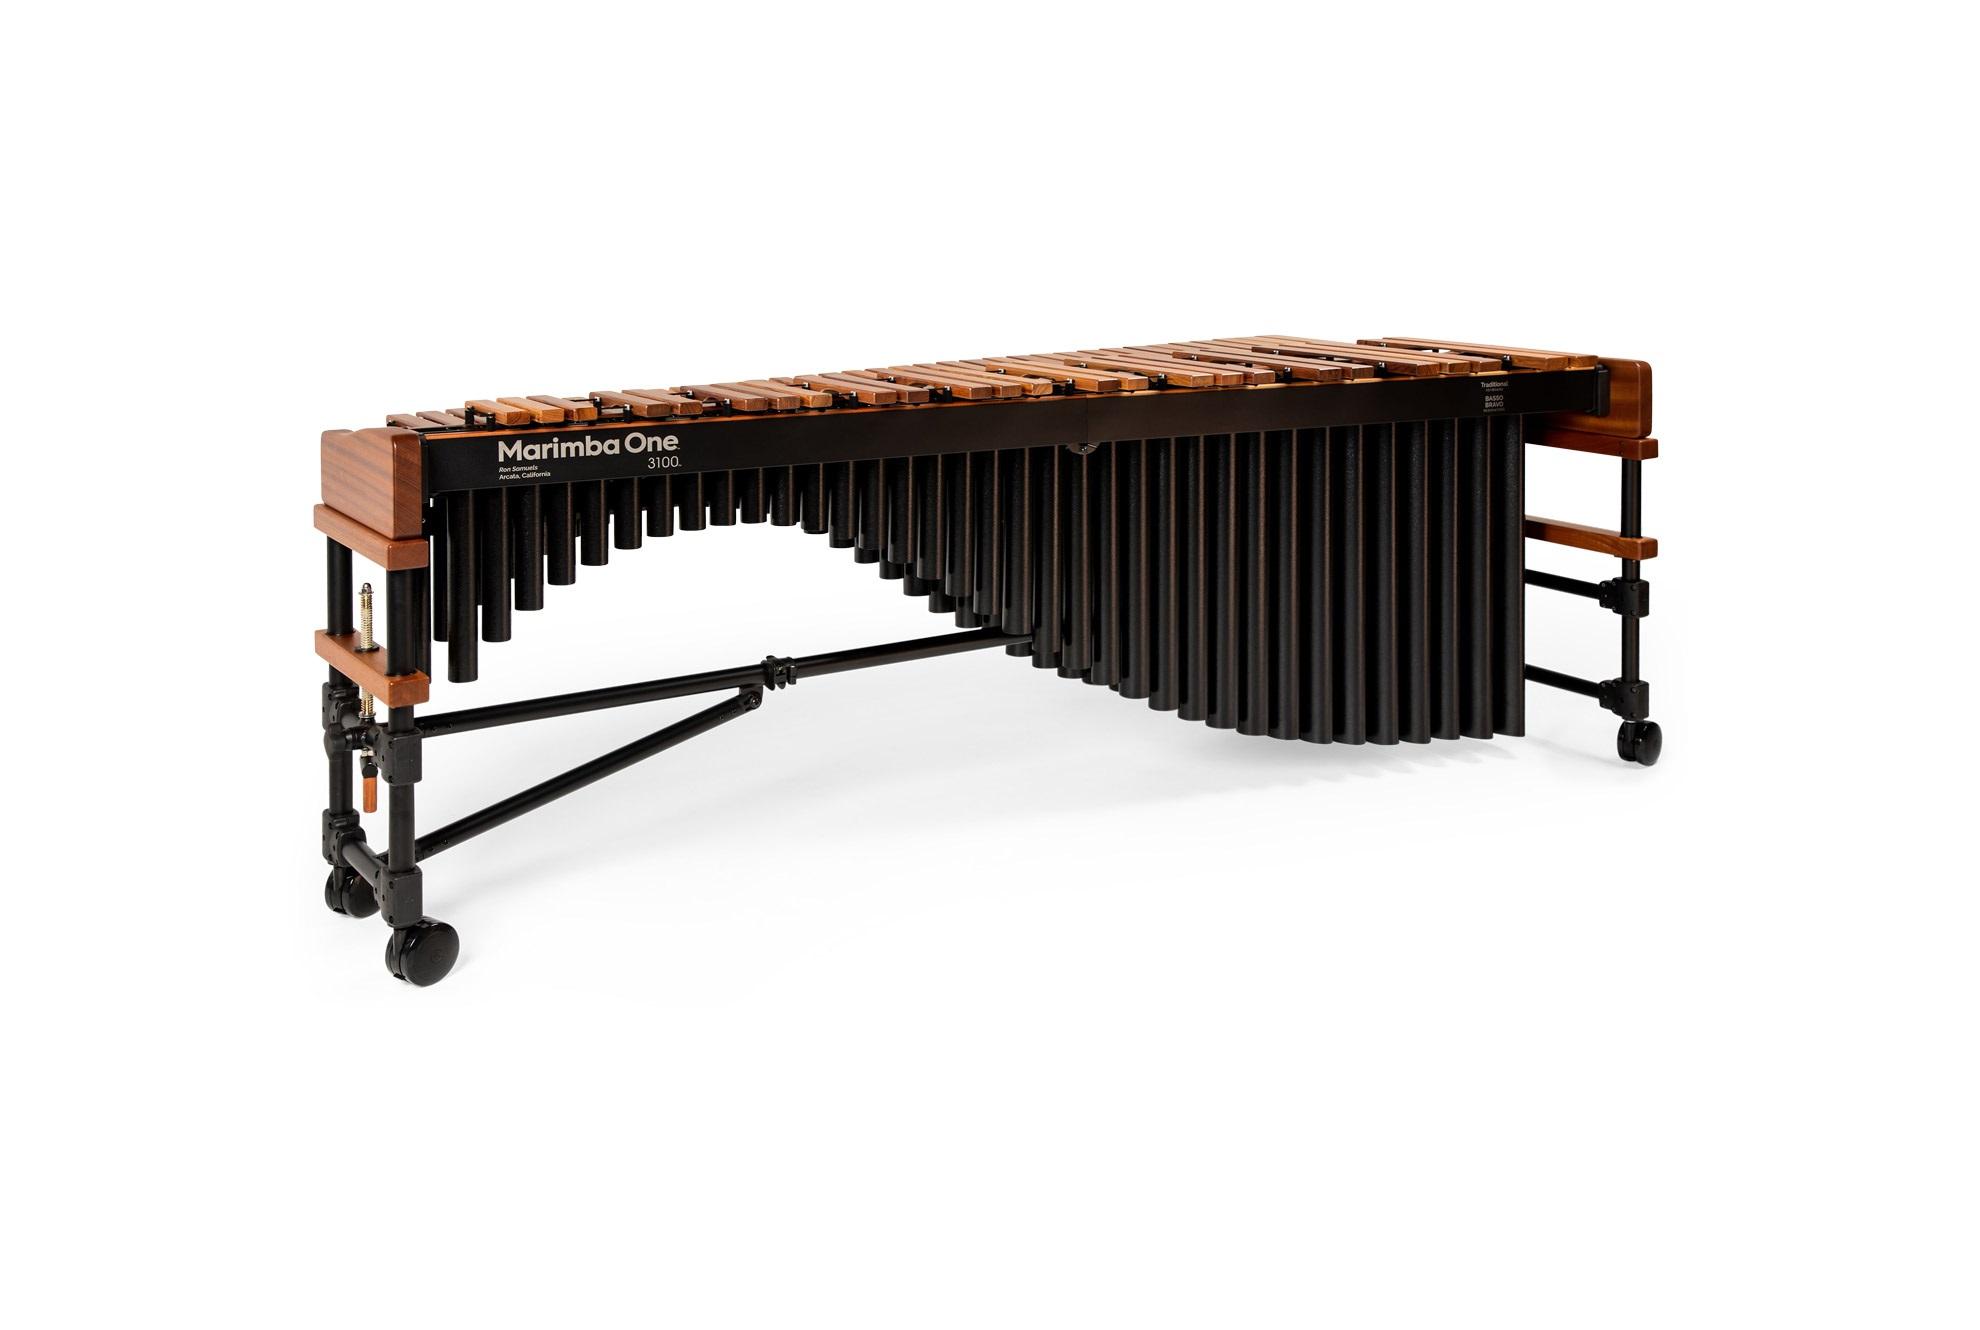 Marimba One 3100 Marimba